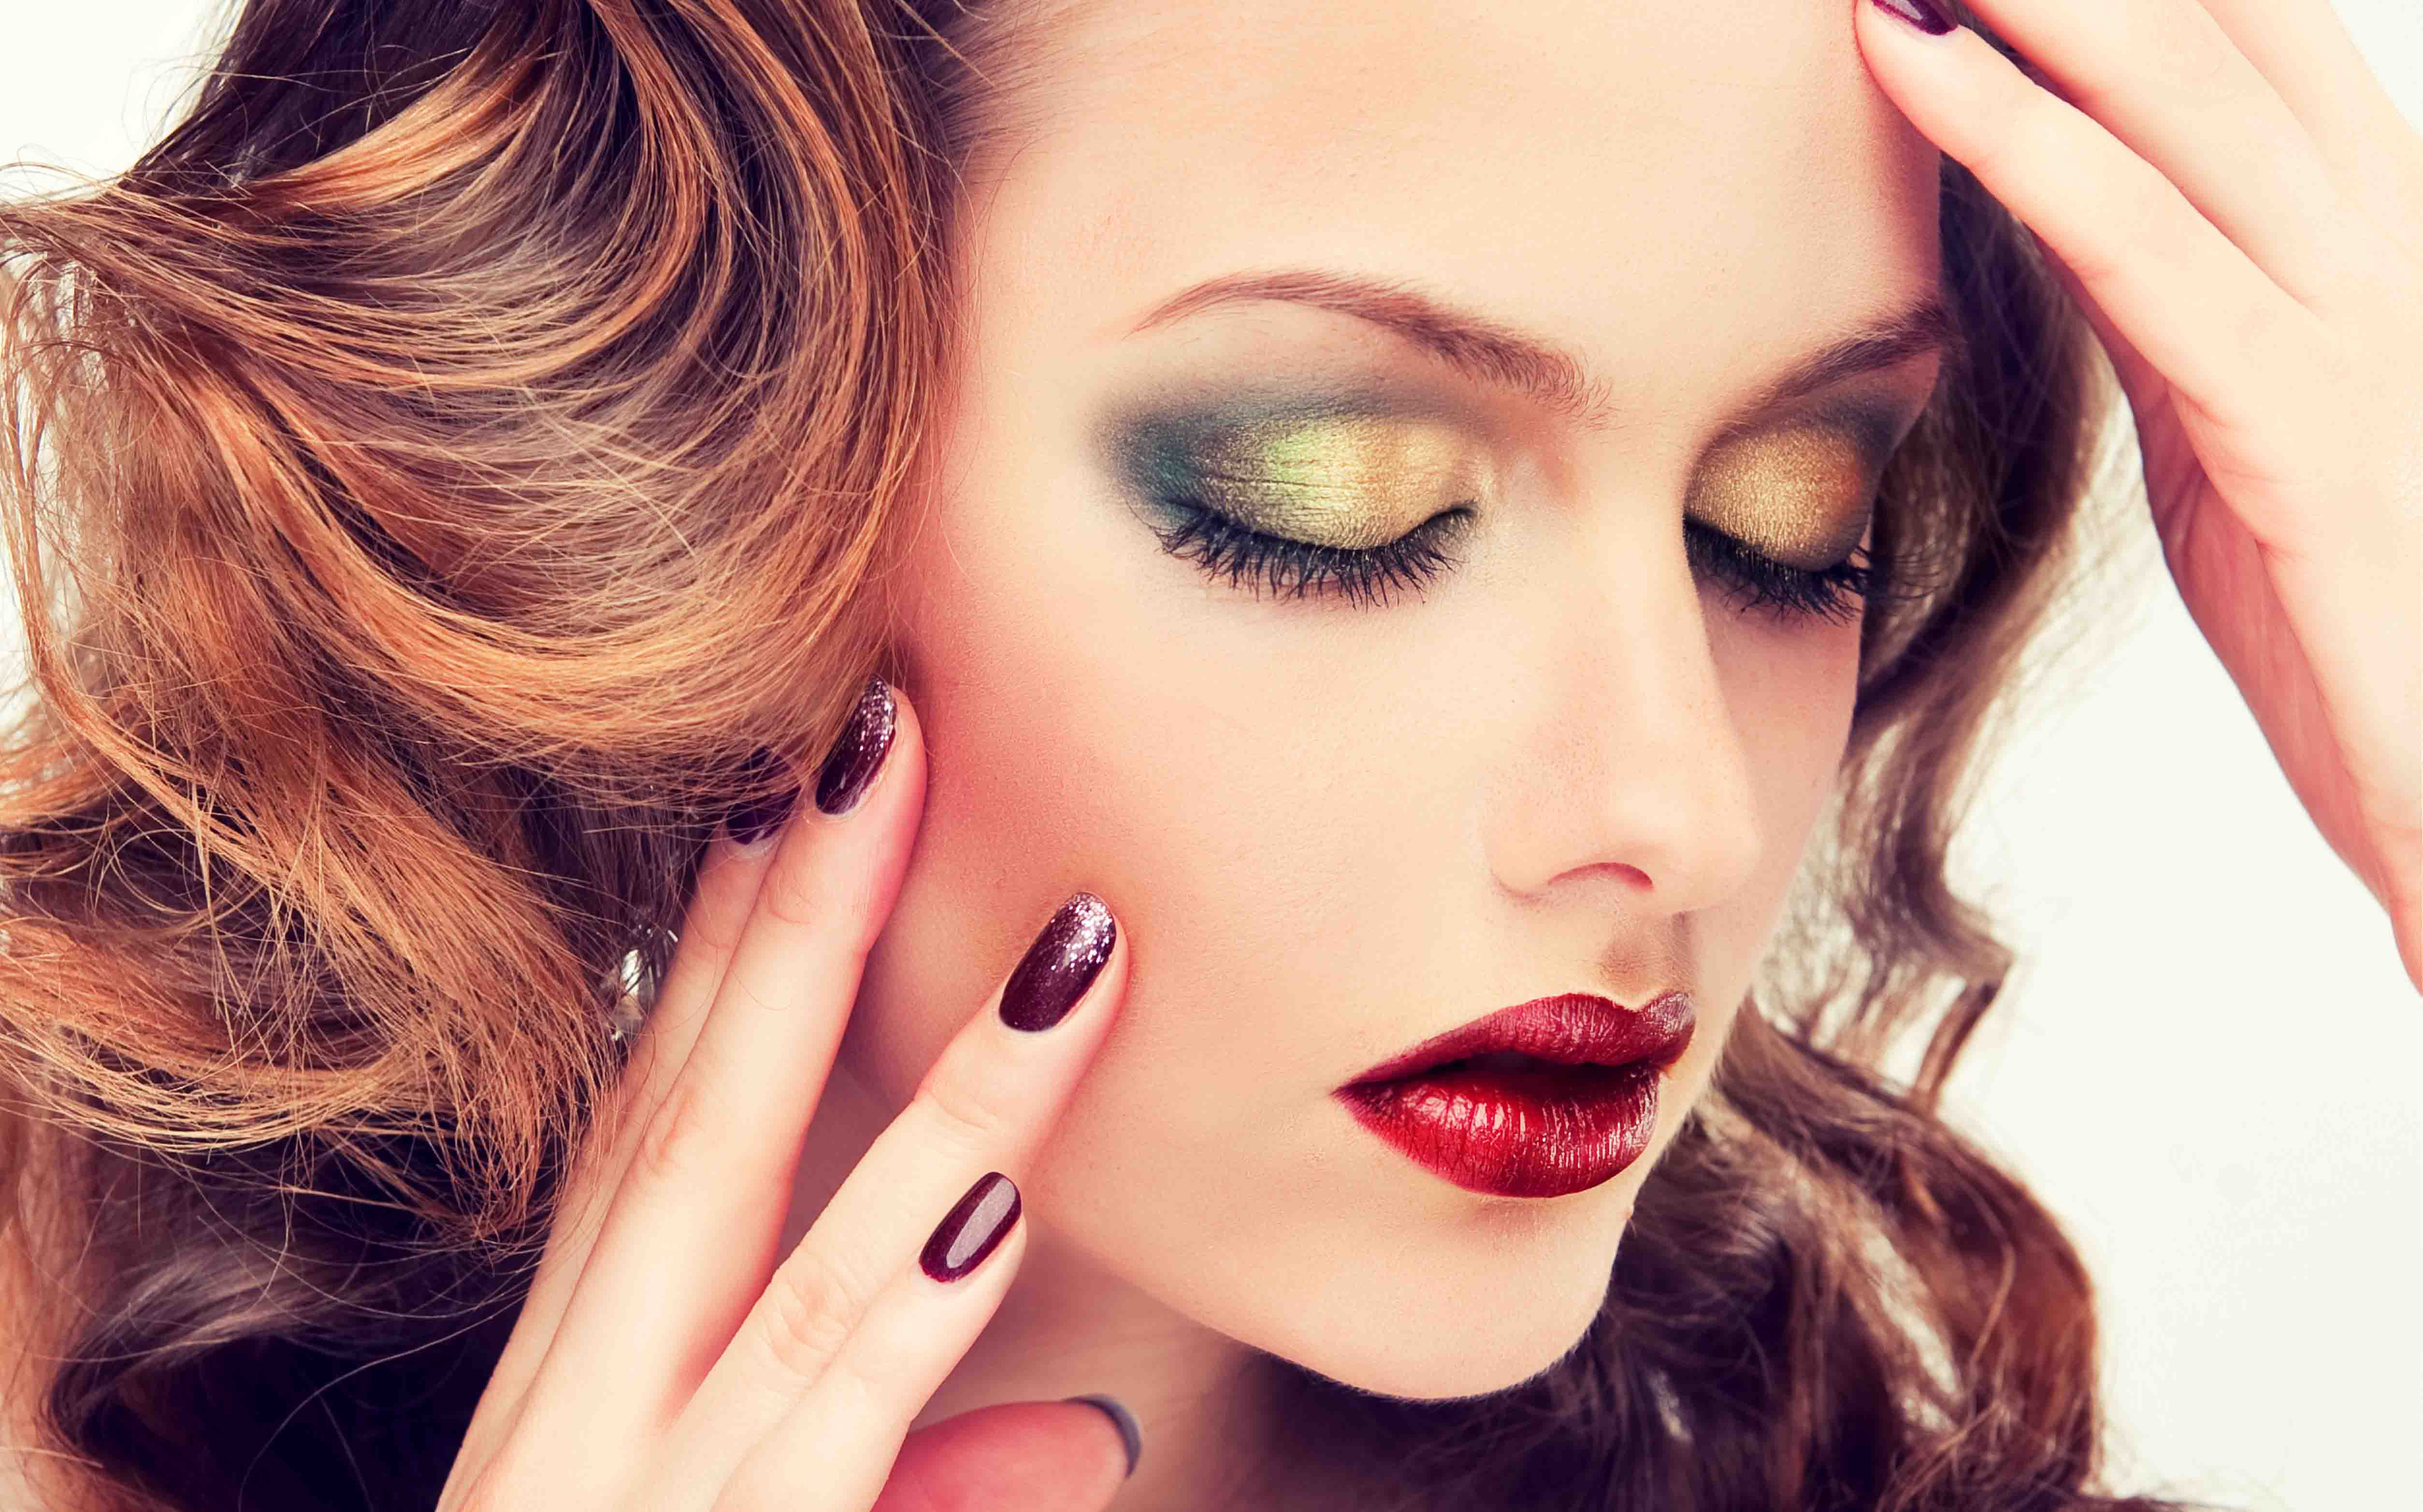 makeup-capodanno-2021-zephir-parrucchieri-ascona-muralto